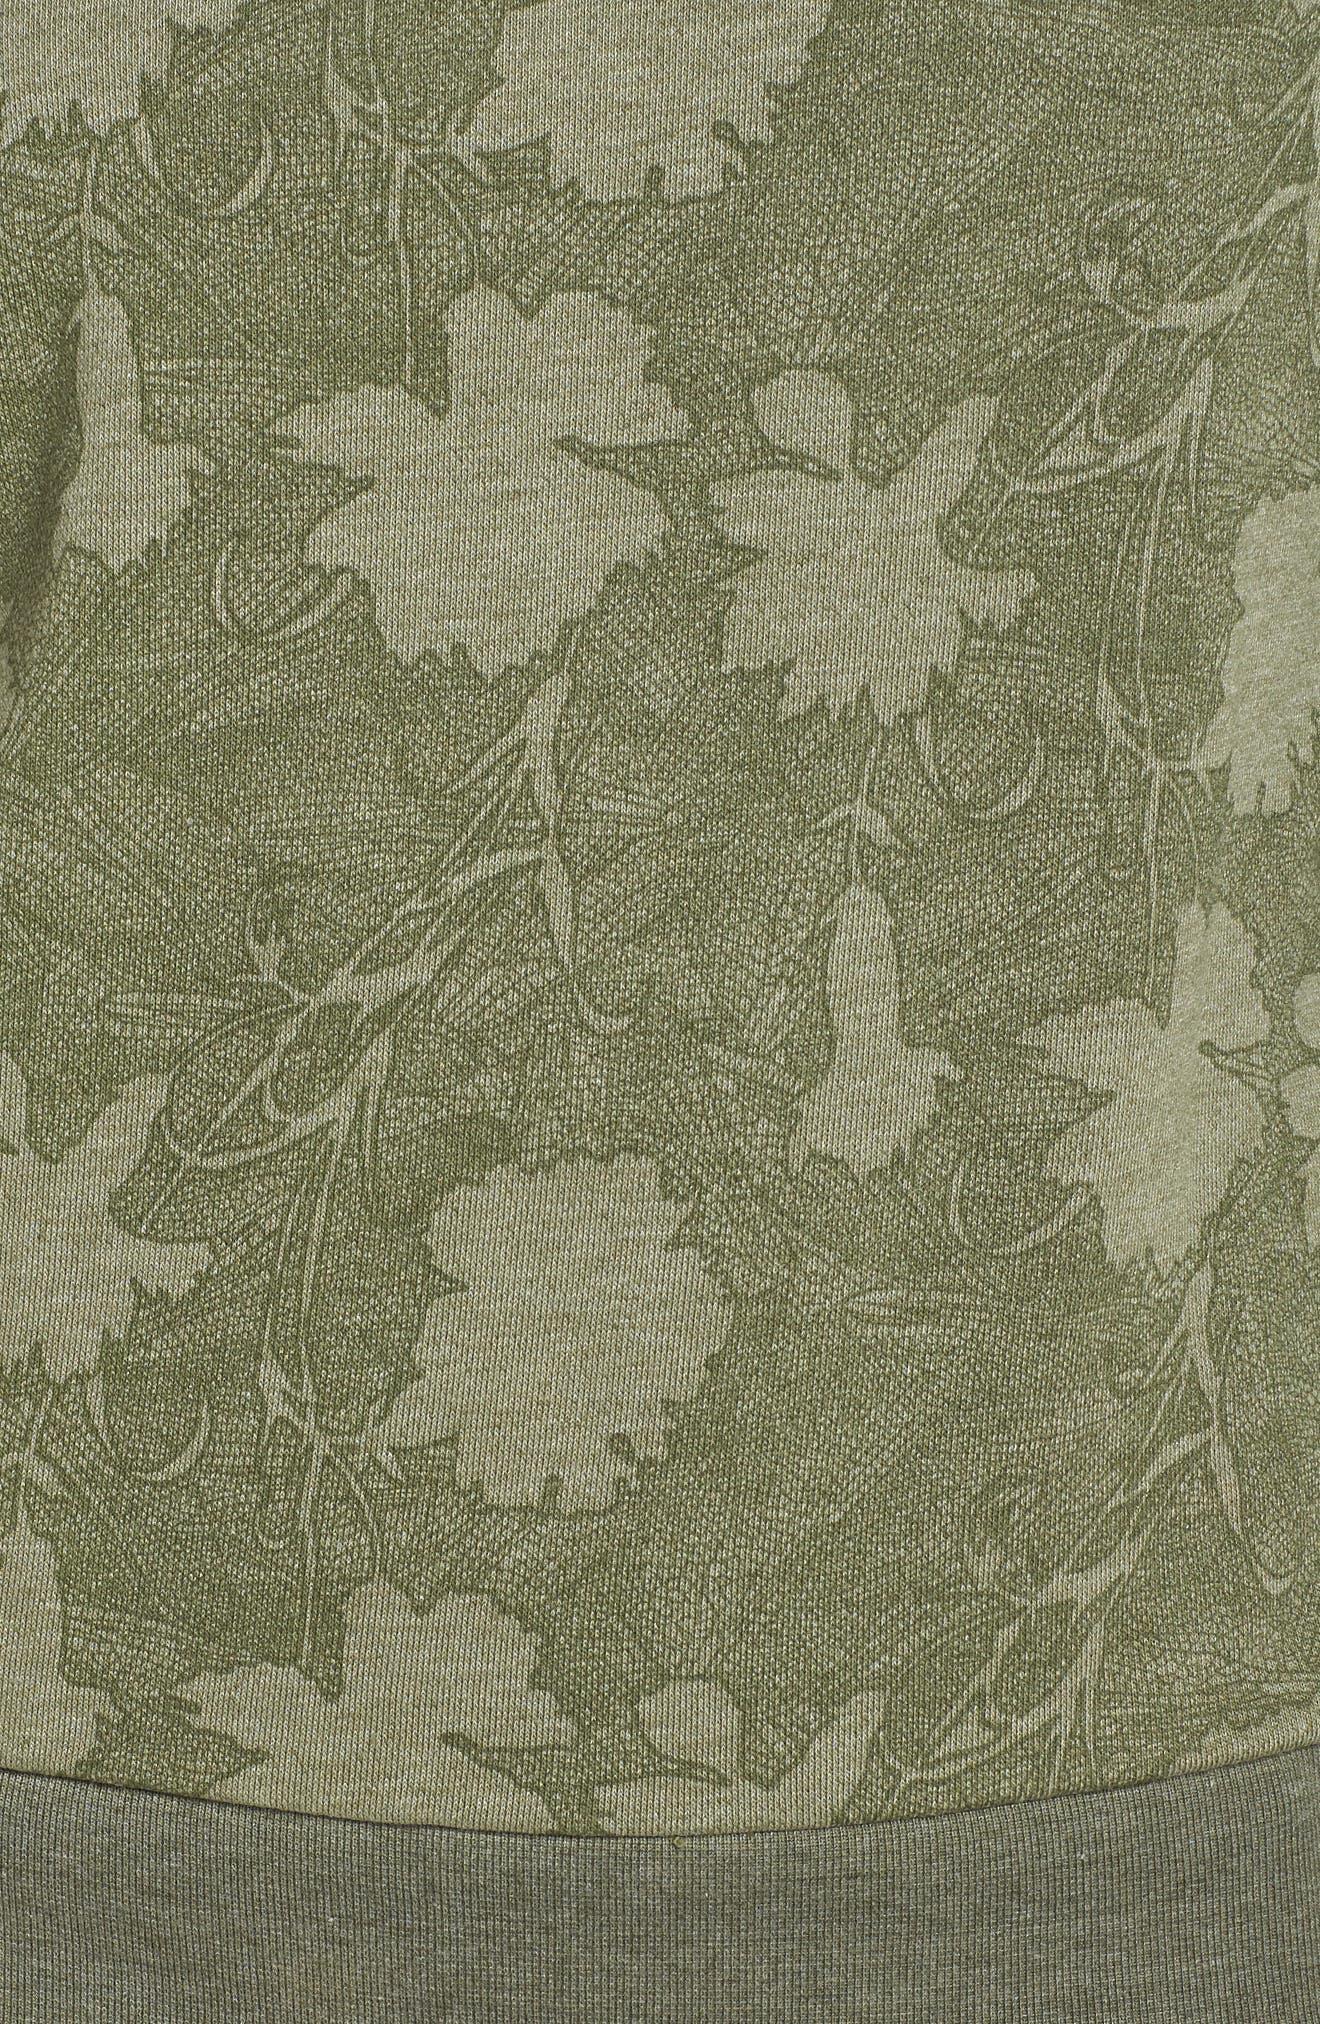 Sleek Leaf Kale Sweatshirt,                             Alternate thumbnail 6, color,                             GREEN